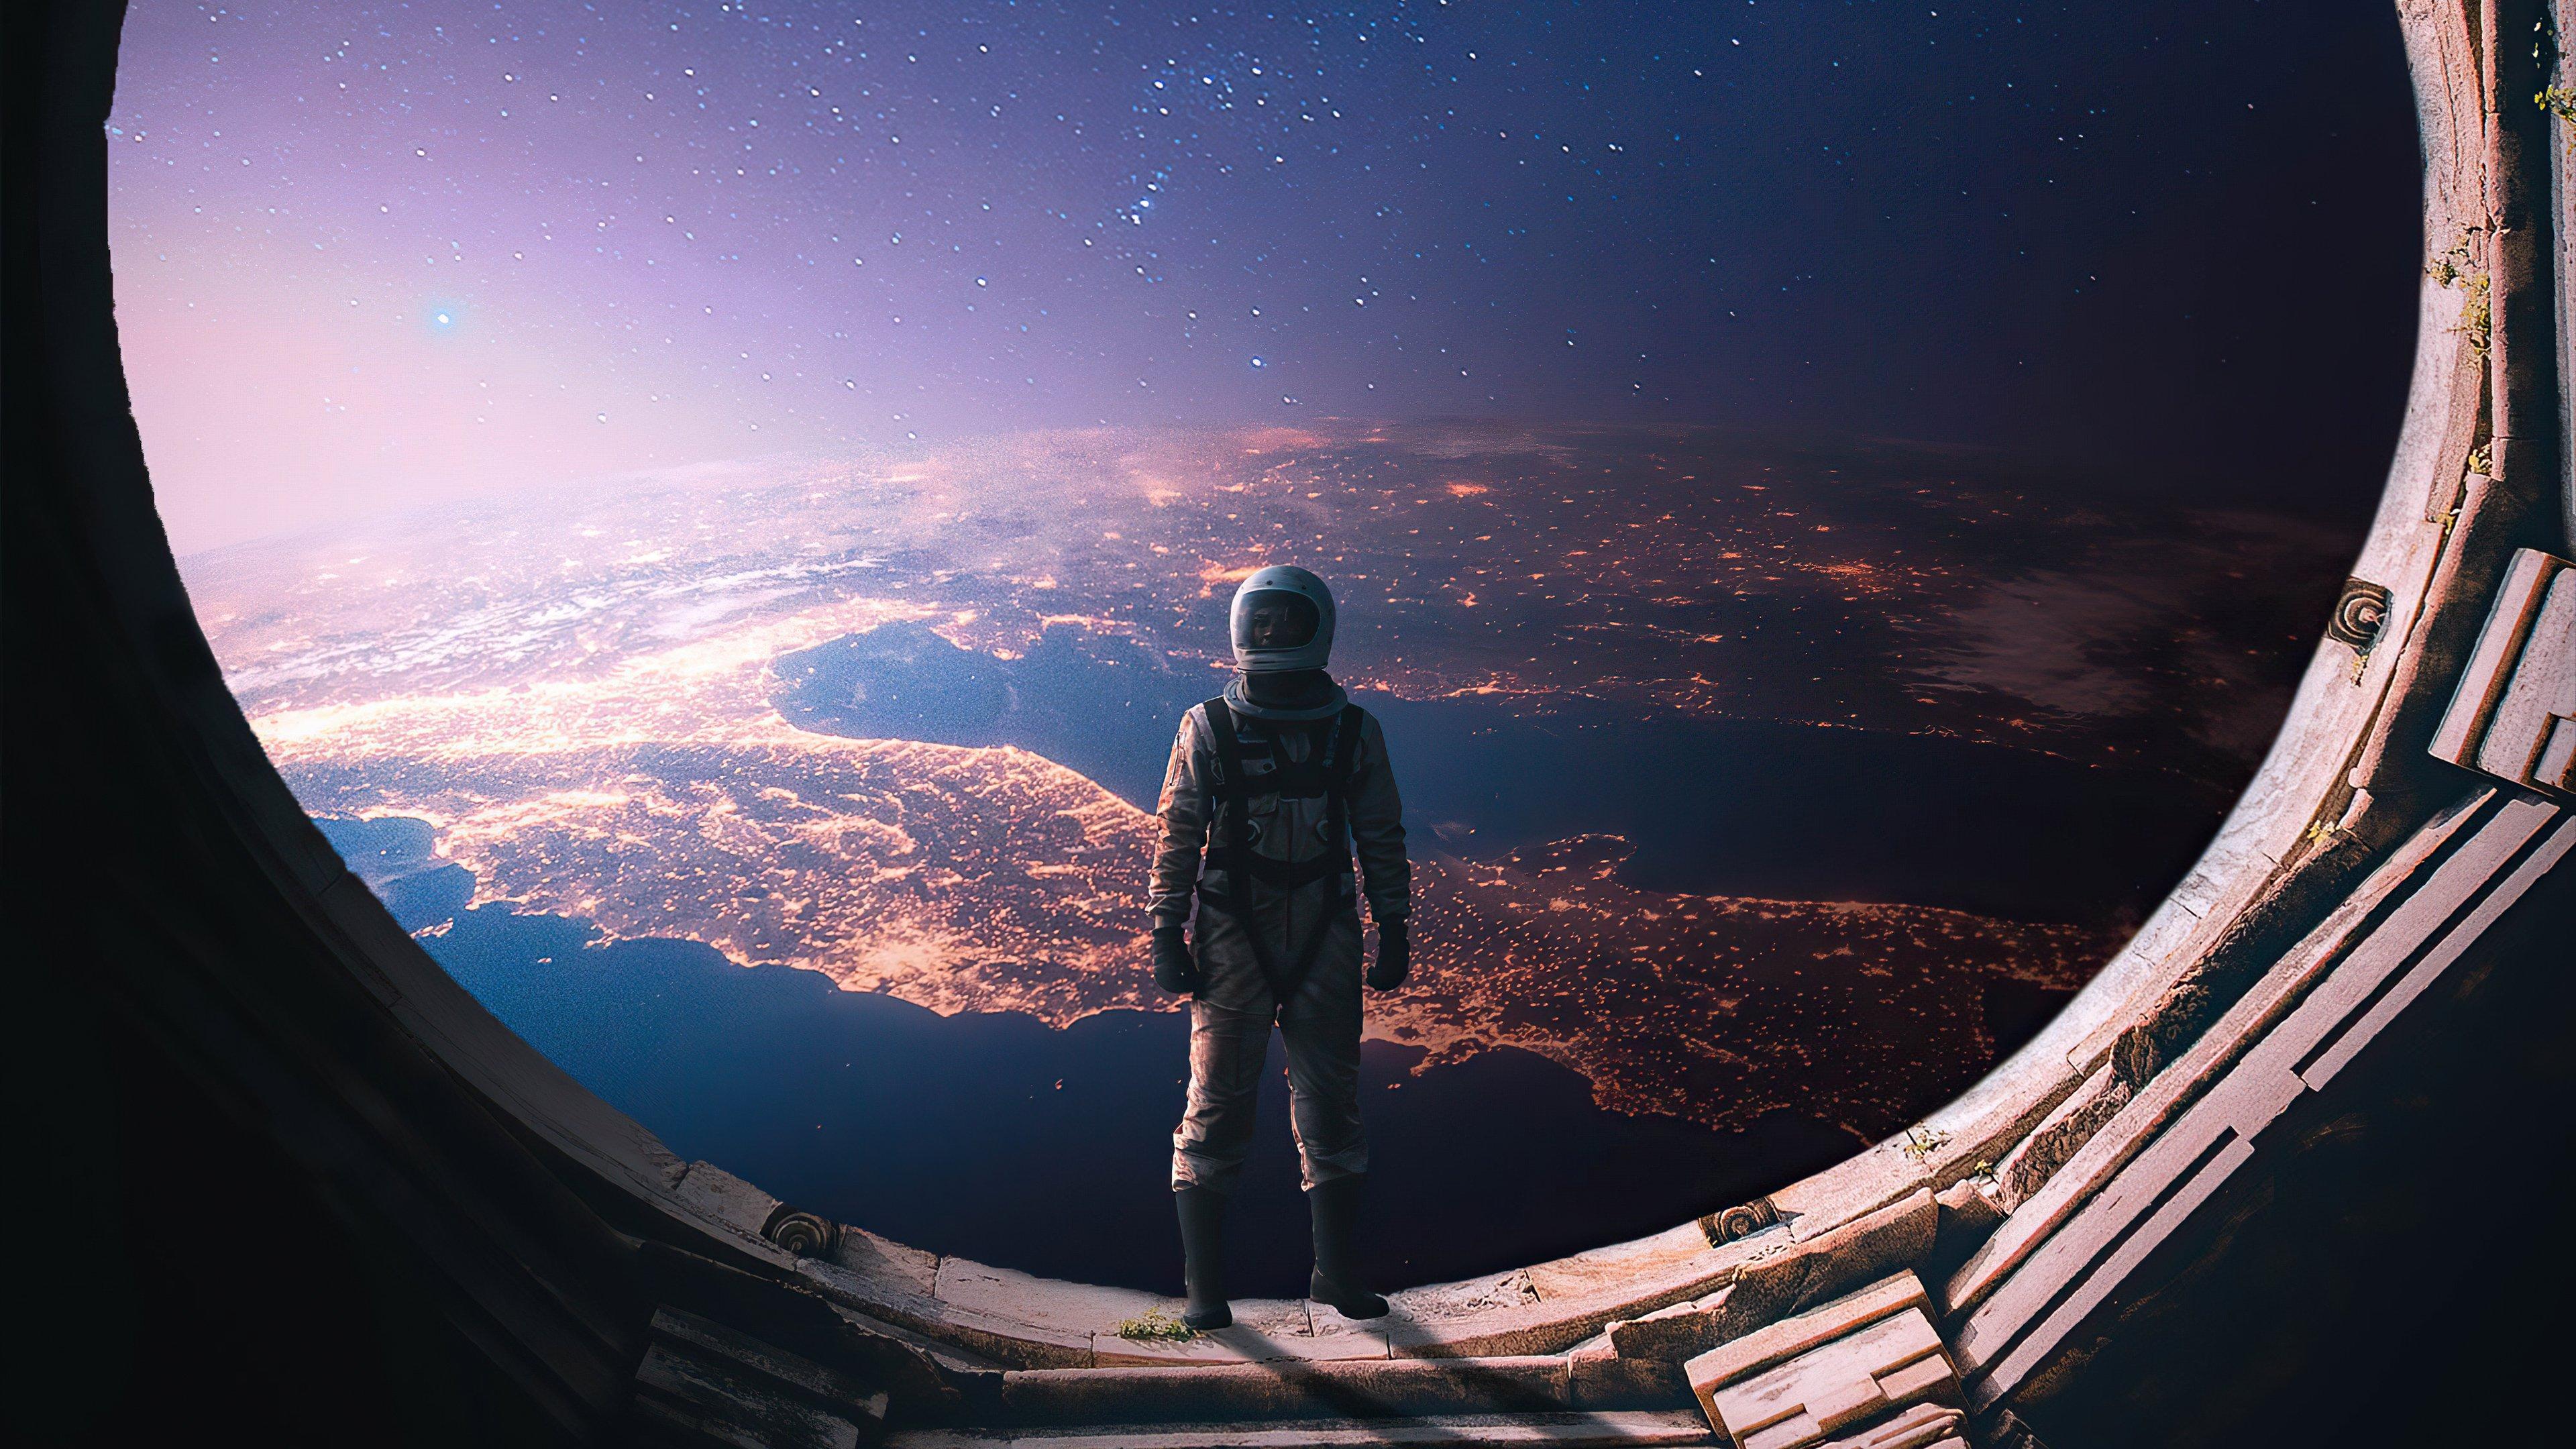 Wallpaper Interstellar Astronaut